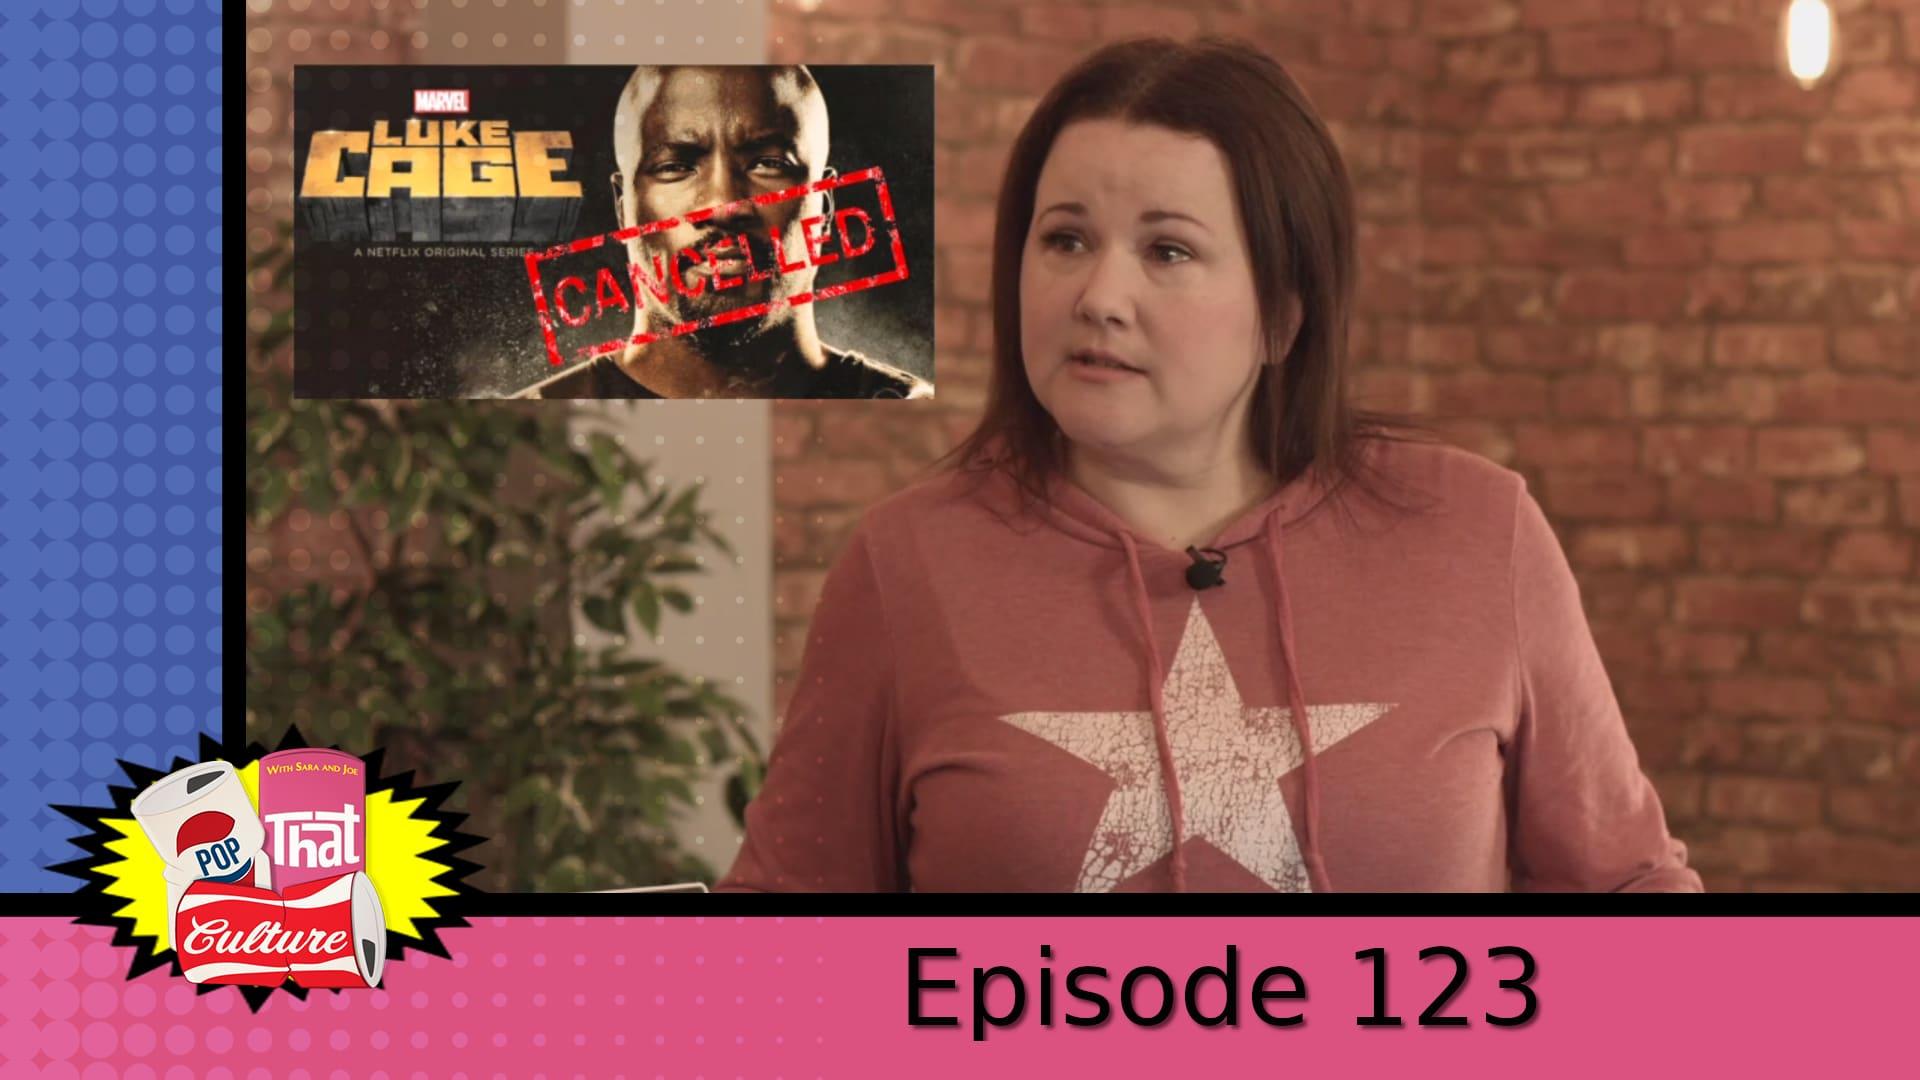 Pop That Culture - Episode 123